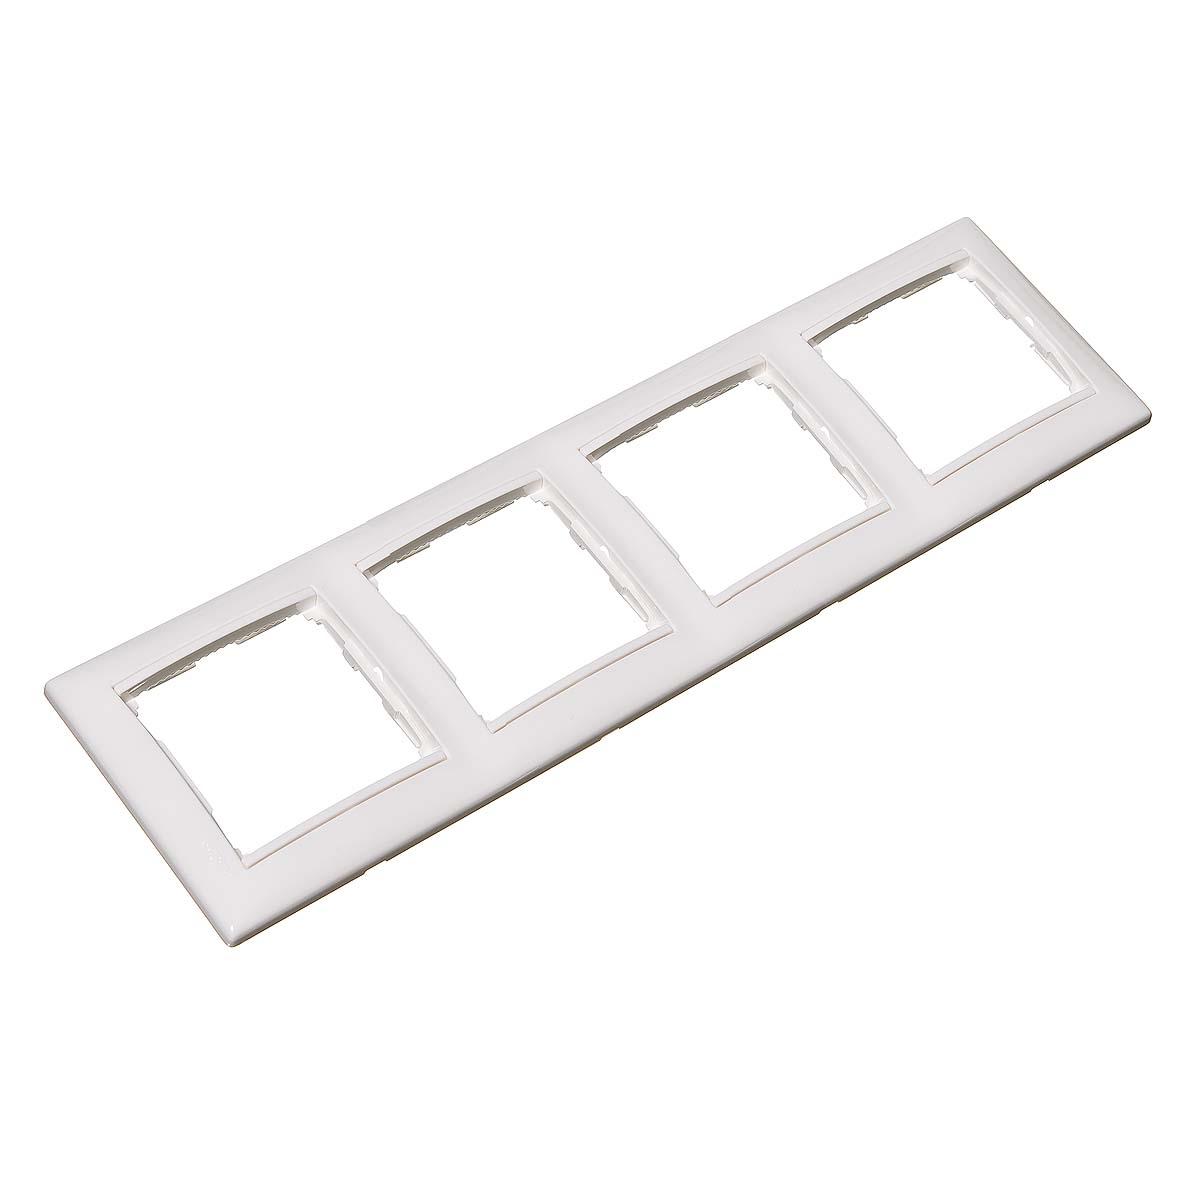 Рамка четырехместная Legrand Valena белая